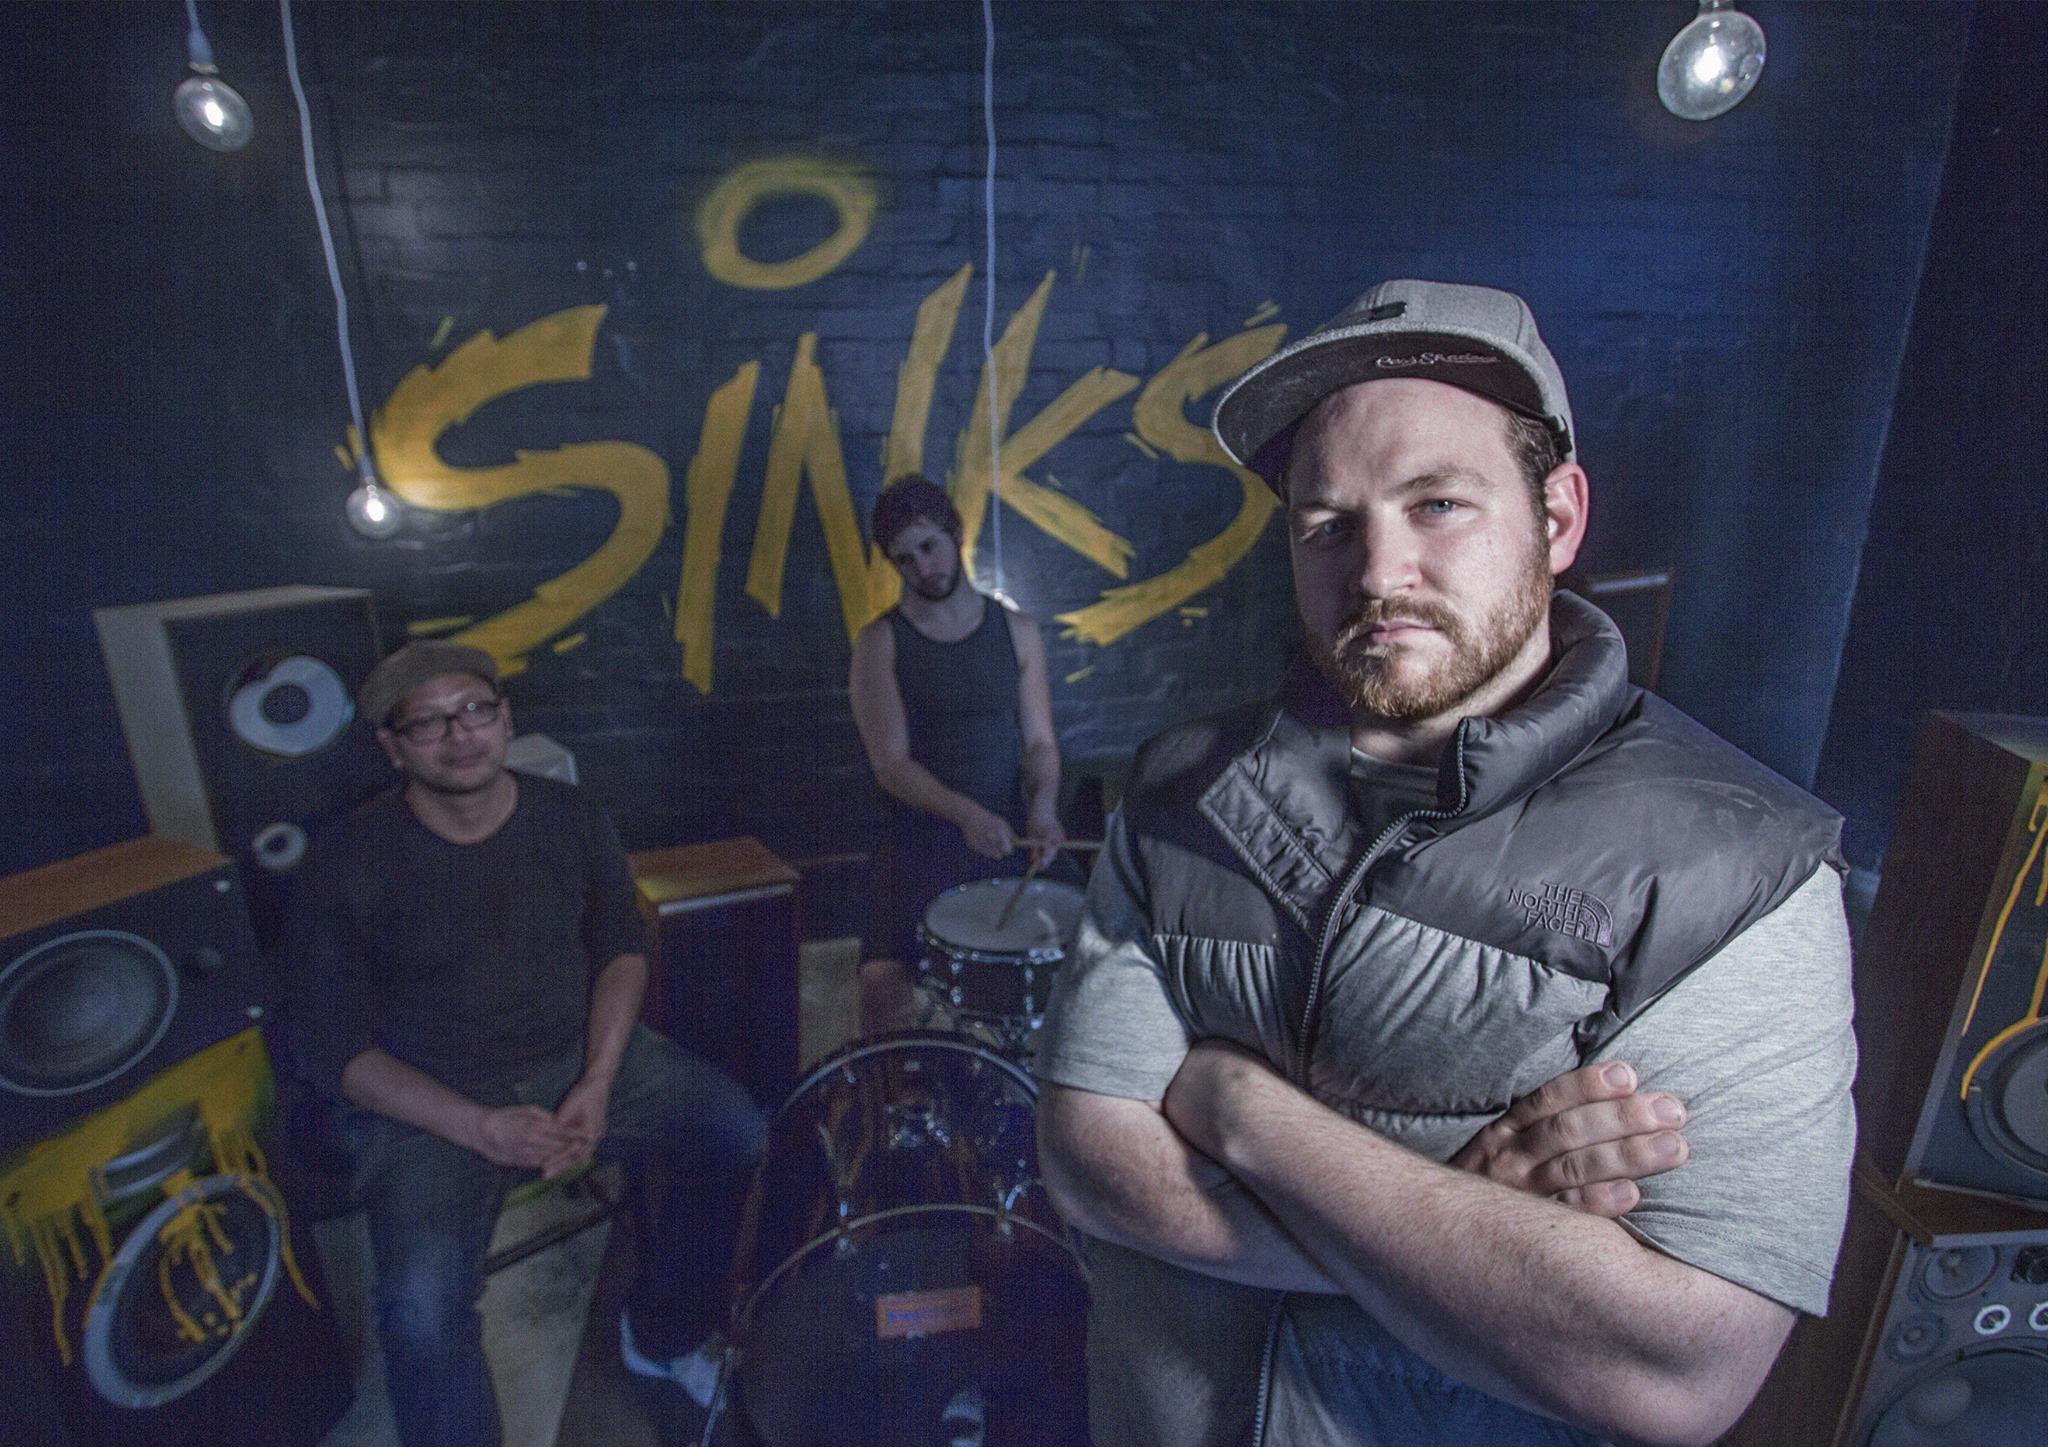 Sinks Promo shot.jpg